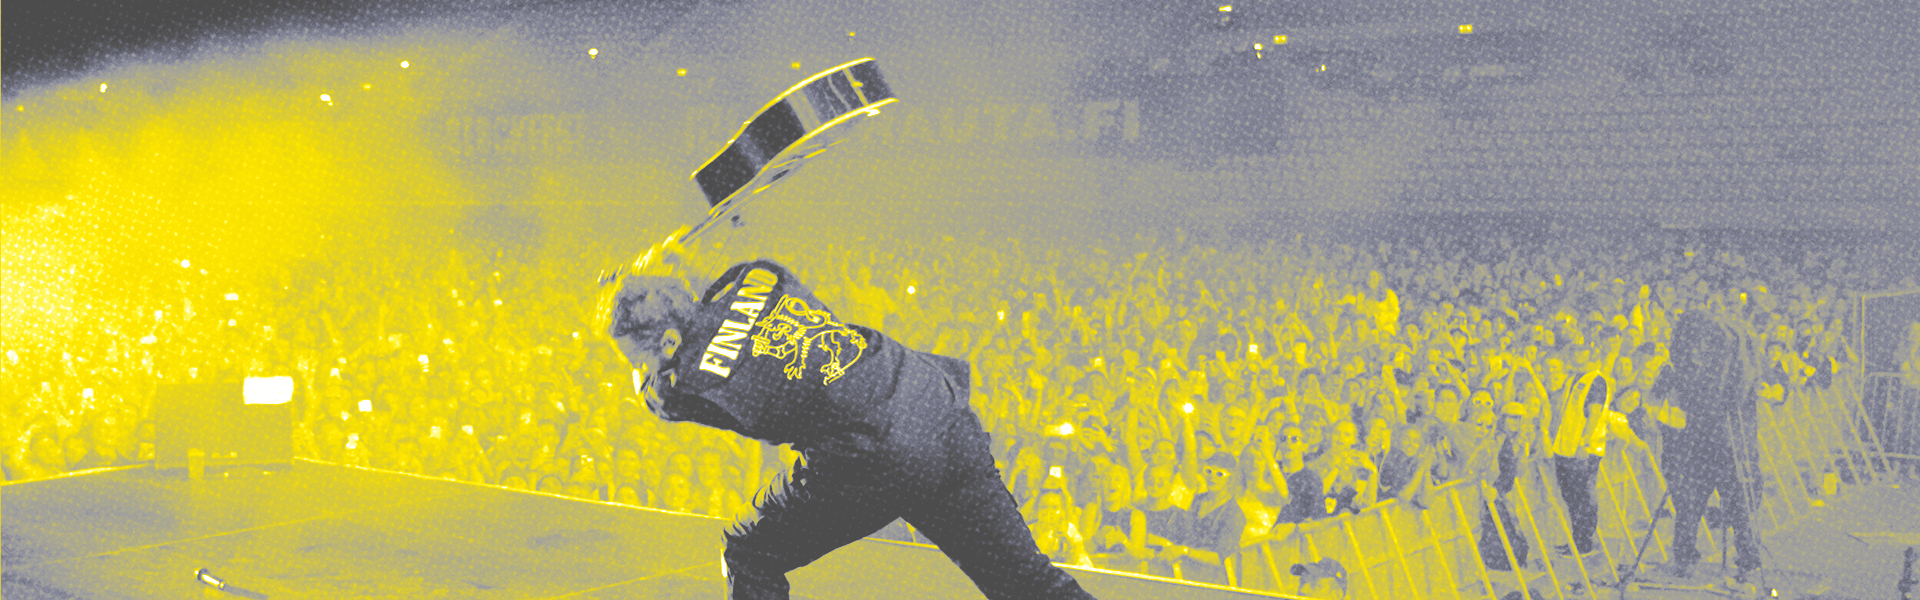 Post Malone | Royal Arena